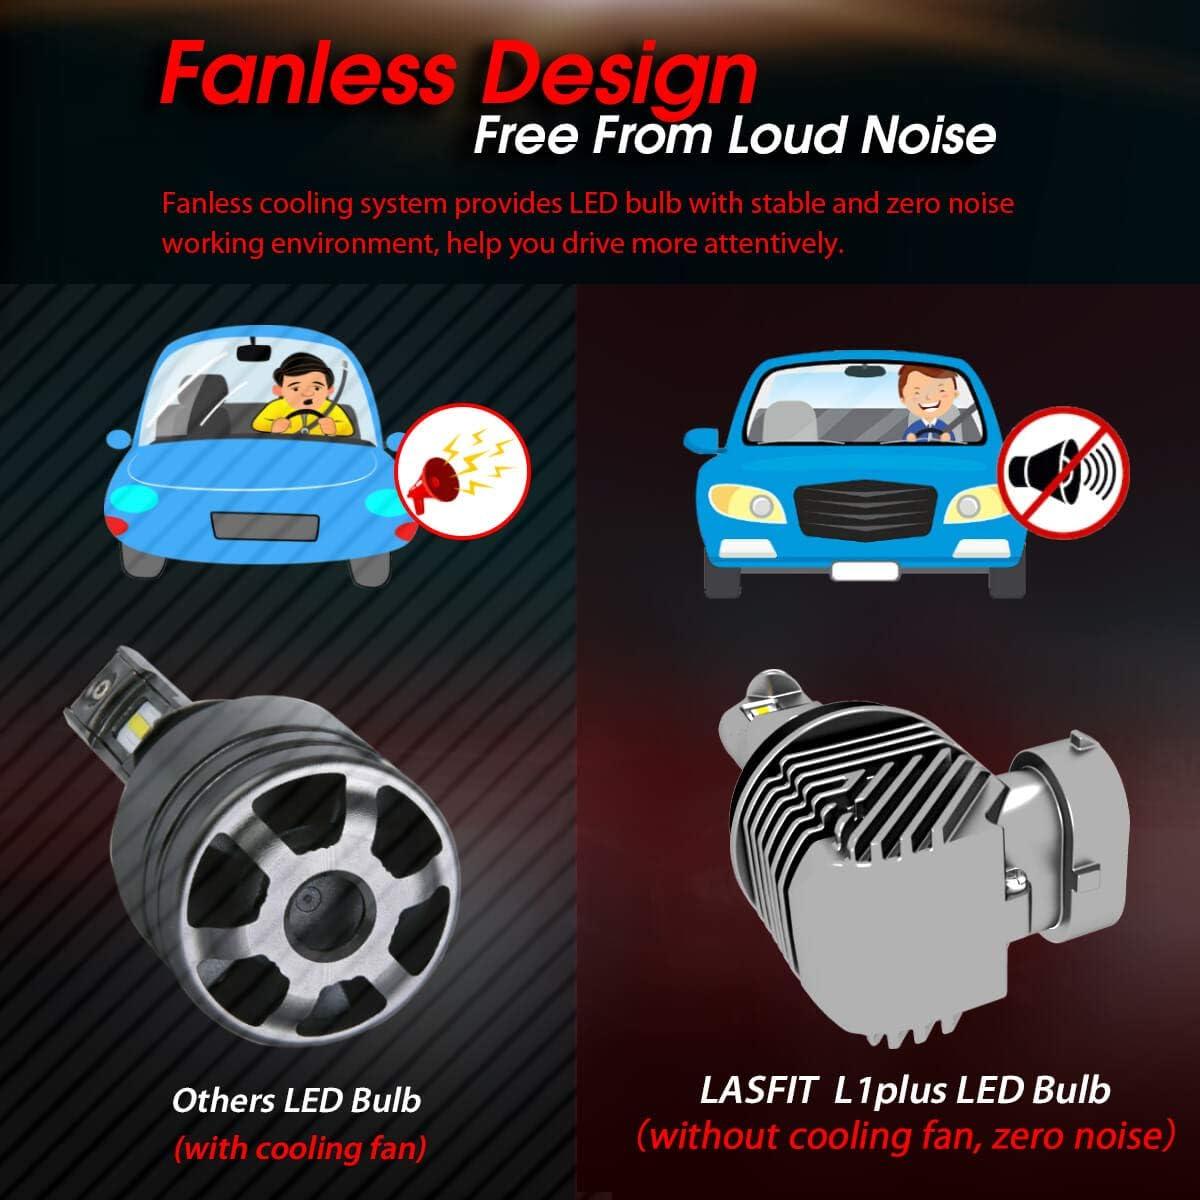 6000K Cool White H8 H16 H11 Fog Light Bulbs Replacement 4000lm Per Set LASFIT H11 LED Fog Light Bulb Fanless Pack of 2 Plug N Play